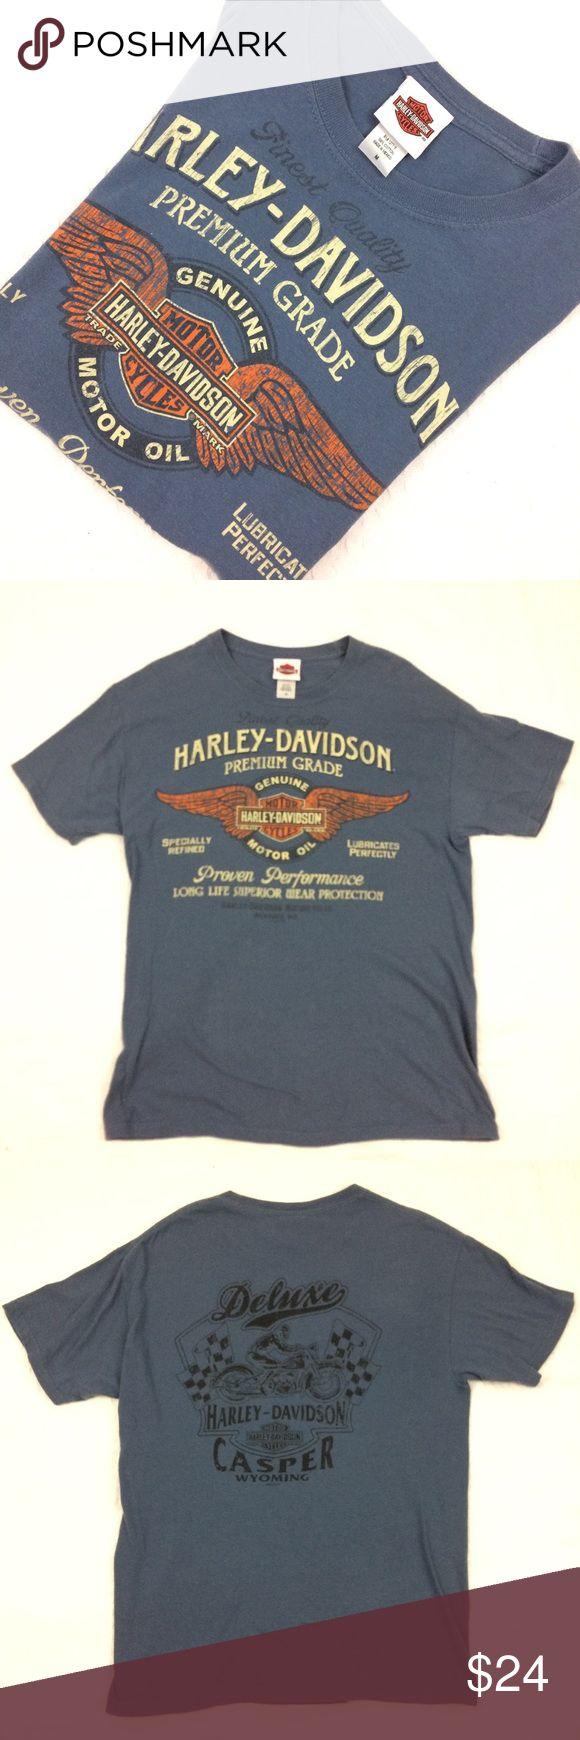 Harley Davidson Casper Wyoming Tshirt This is a gently used Harley Davidson Tshirt Casper Wyoming. Mens sz M in Gray Blue color Harley-Davidson Shirts Tees - Short Sleeve